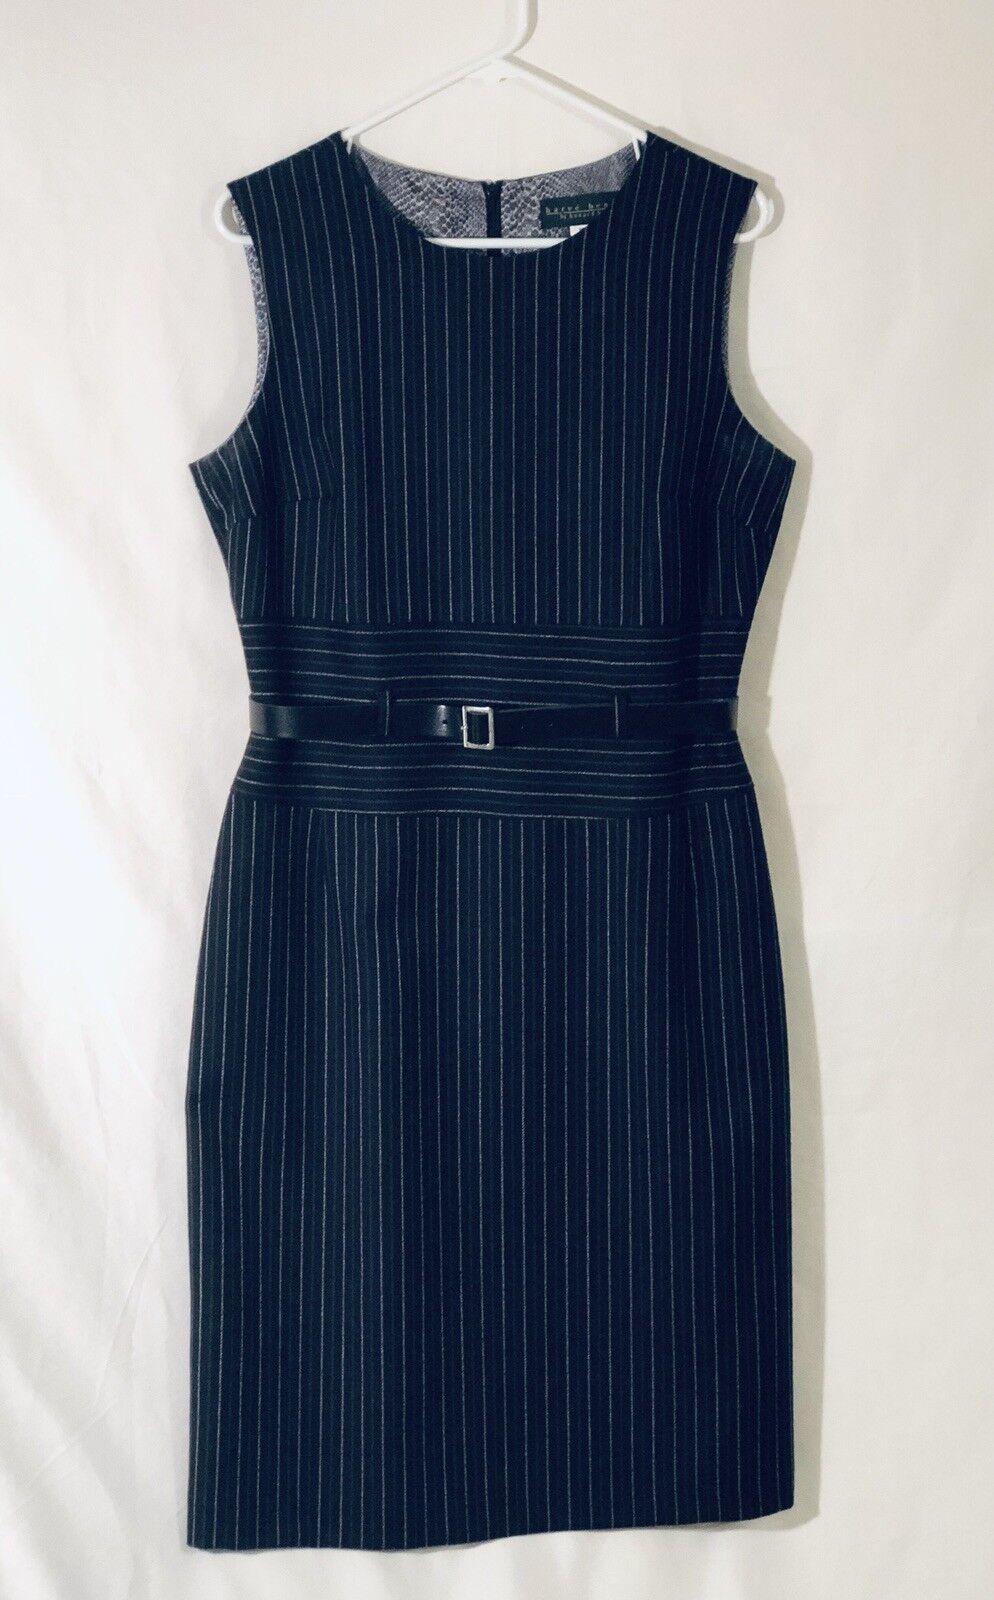 Harve Benard by Benard Holtzman damen Wool Dress Pin Stripe with Belt Größe 12